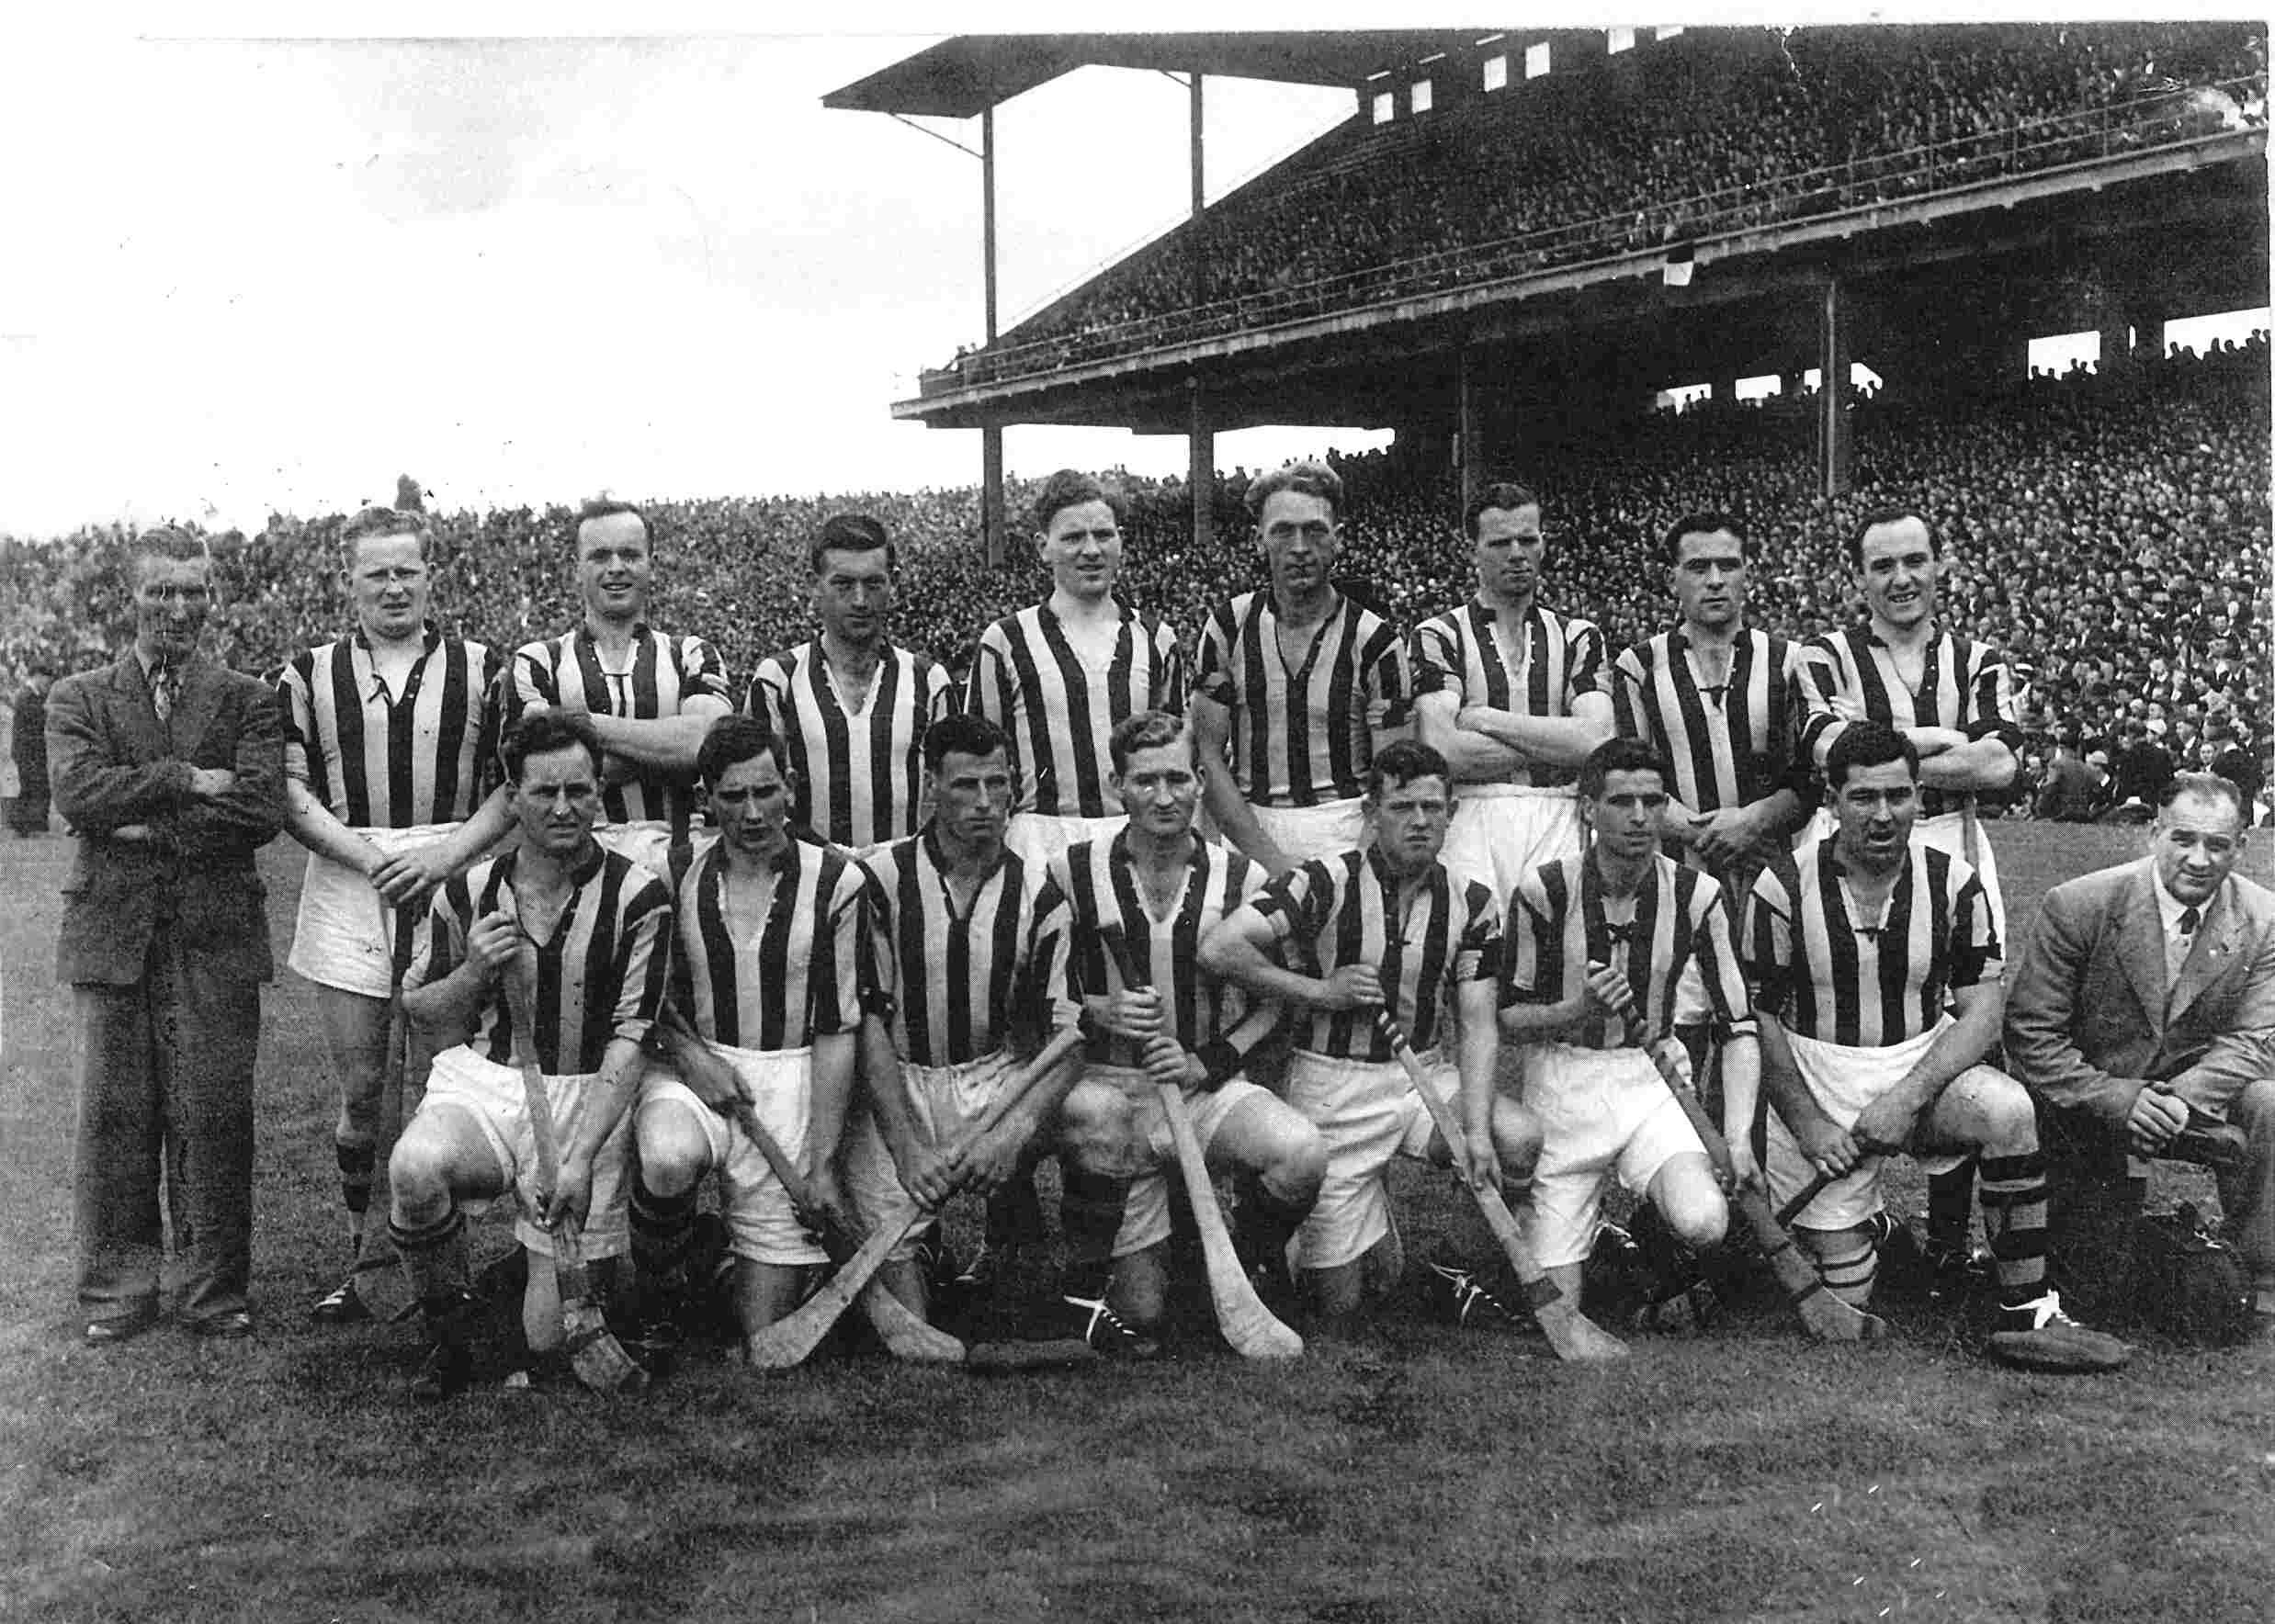 Team beaten by Galway (3-5 to 1-10) in 1953 All Ireland Semi-Final.<br /> Back: Ramie Dowling, Jimmy Heffernan, Mickey Kelly, Sean Clohessy, John Sutton, Dan Kennedy, Shem Downey, Jim Langton.<br /> Front: Bill Walsh, Dick Carroll, Jim Hogan, Mark Marnell, Johnny McGovern (Capt), Paddy Buggy, Diamond Hayden, Syd Bluett.